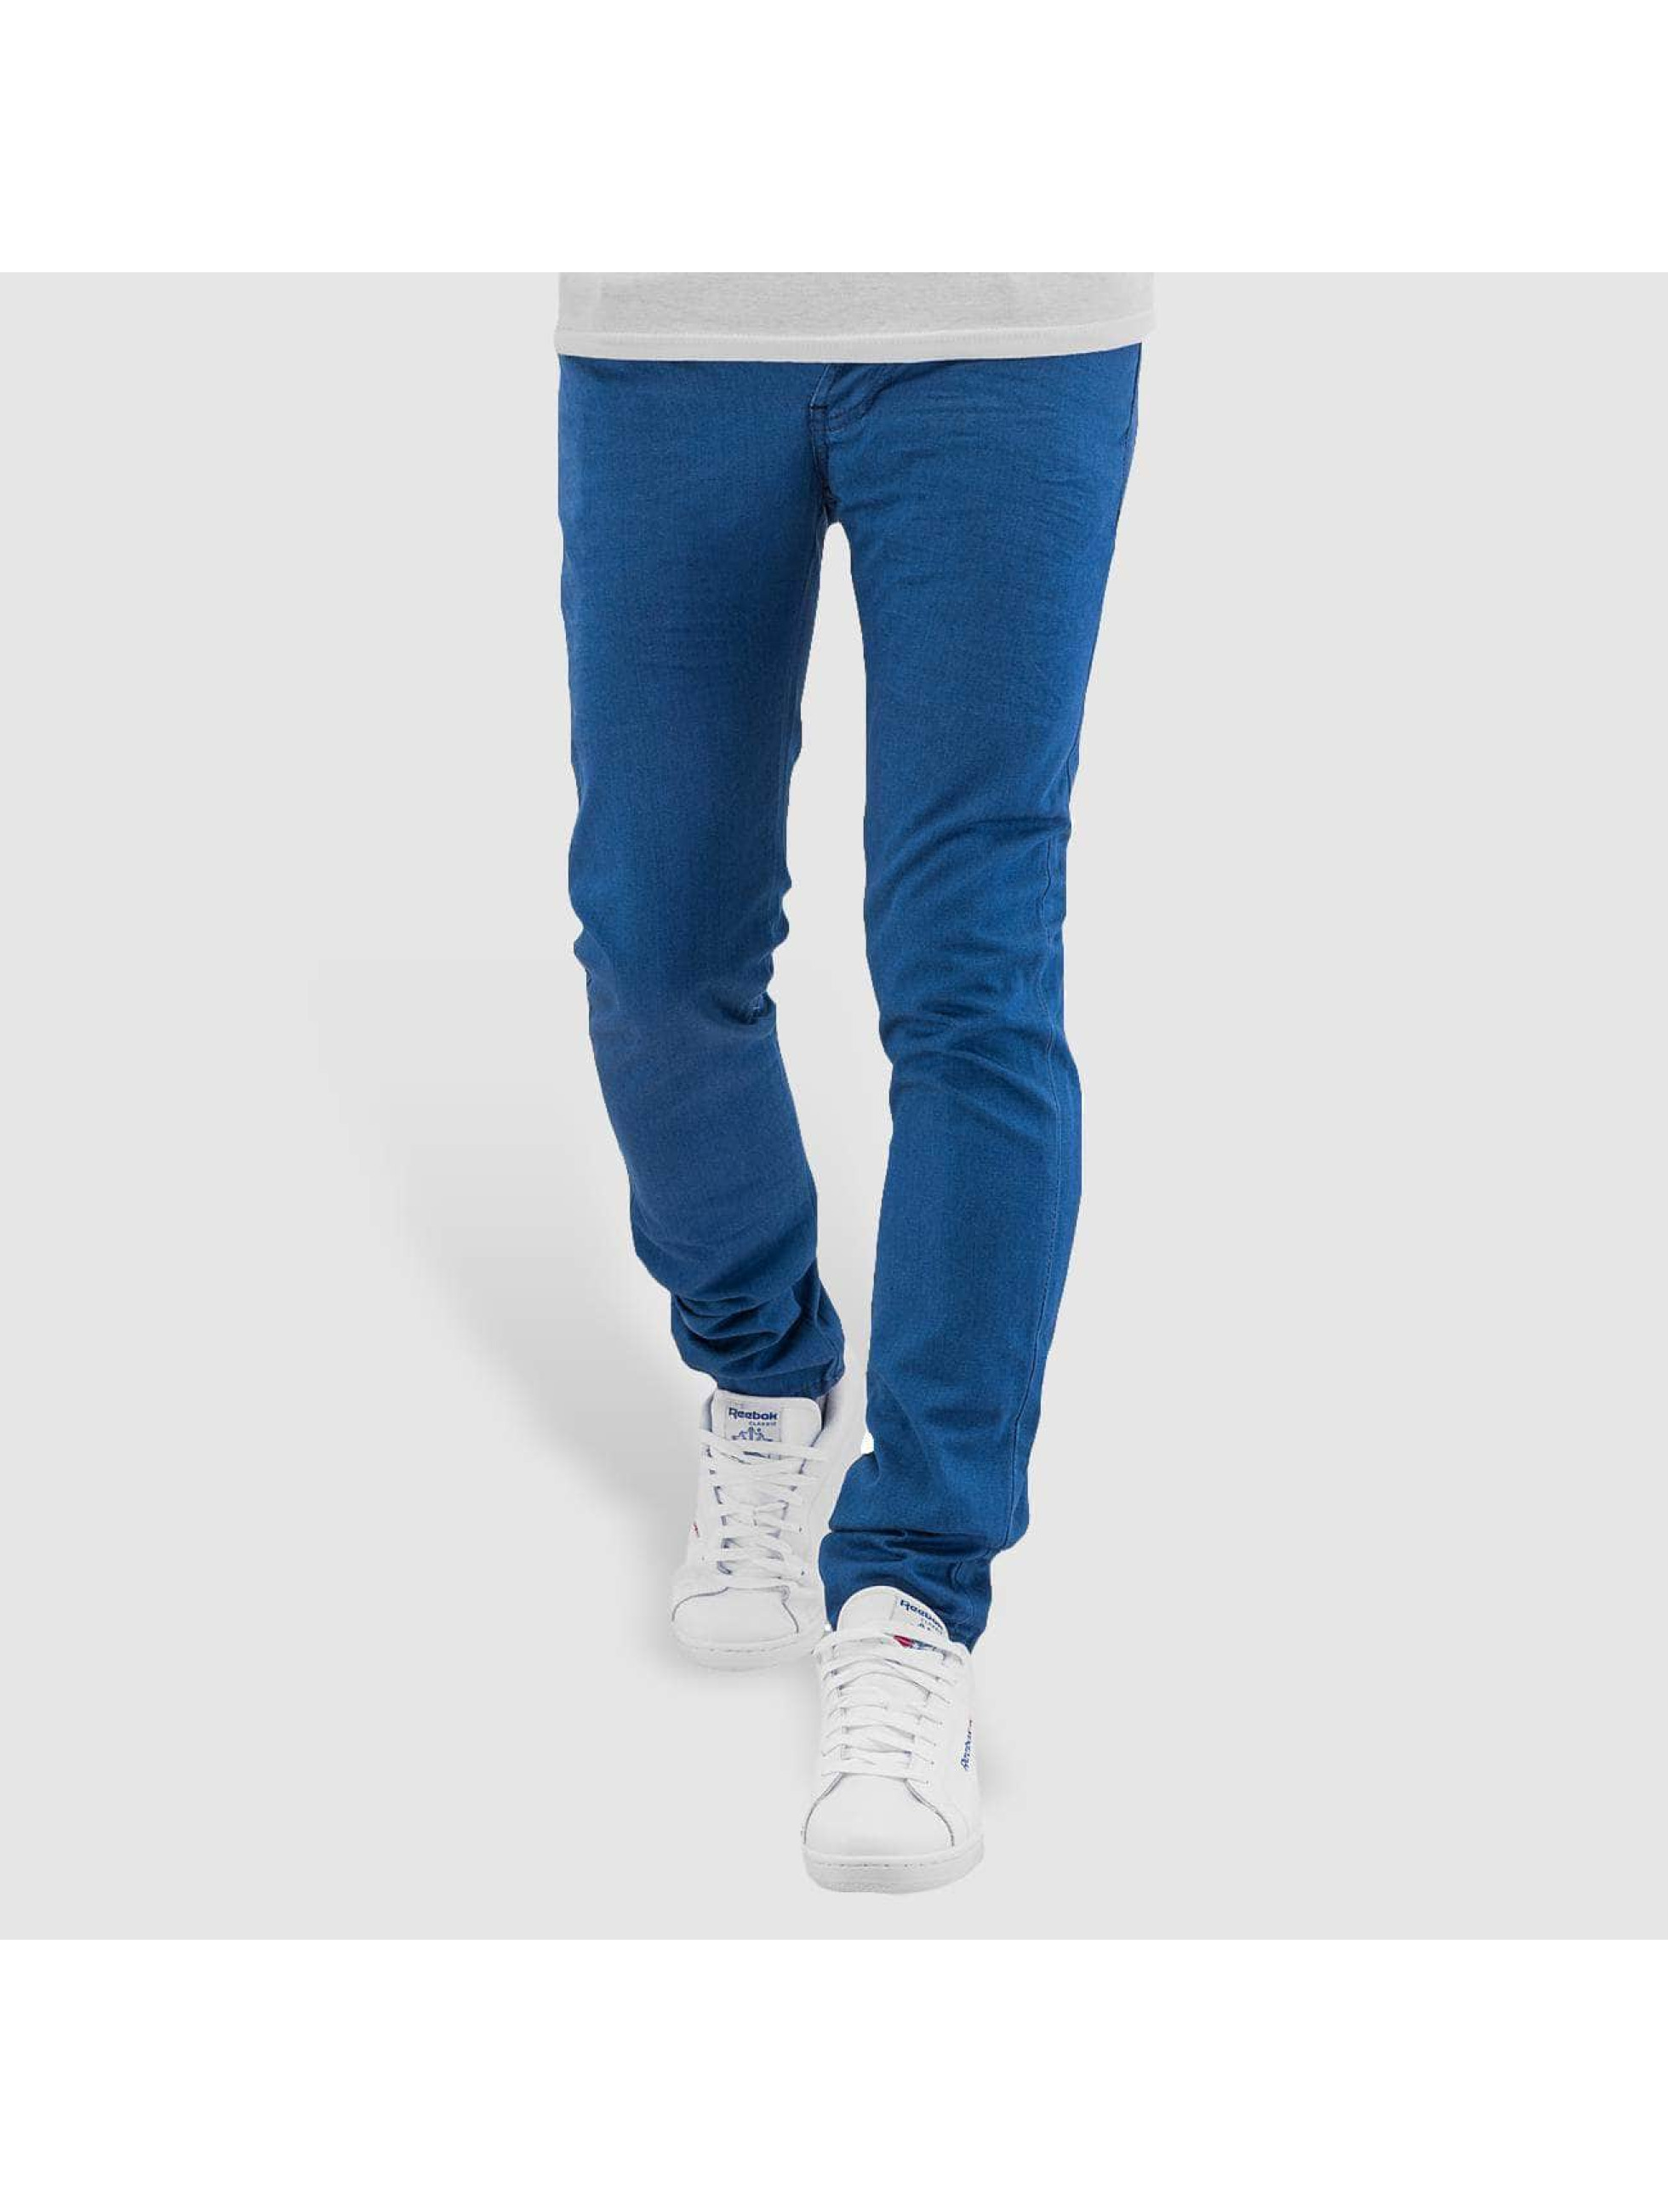 Cazzy Clang Skinny jeans Dye blauw